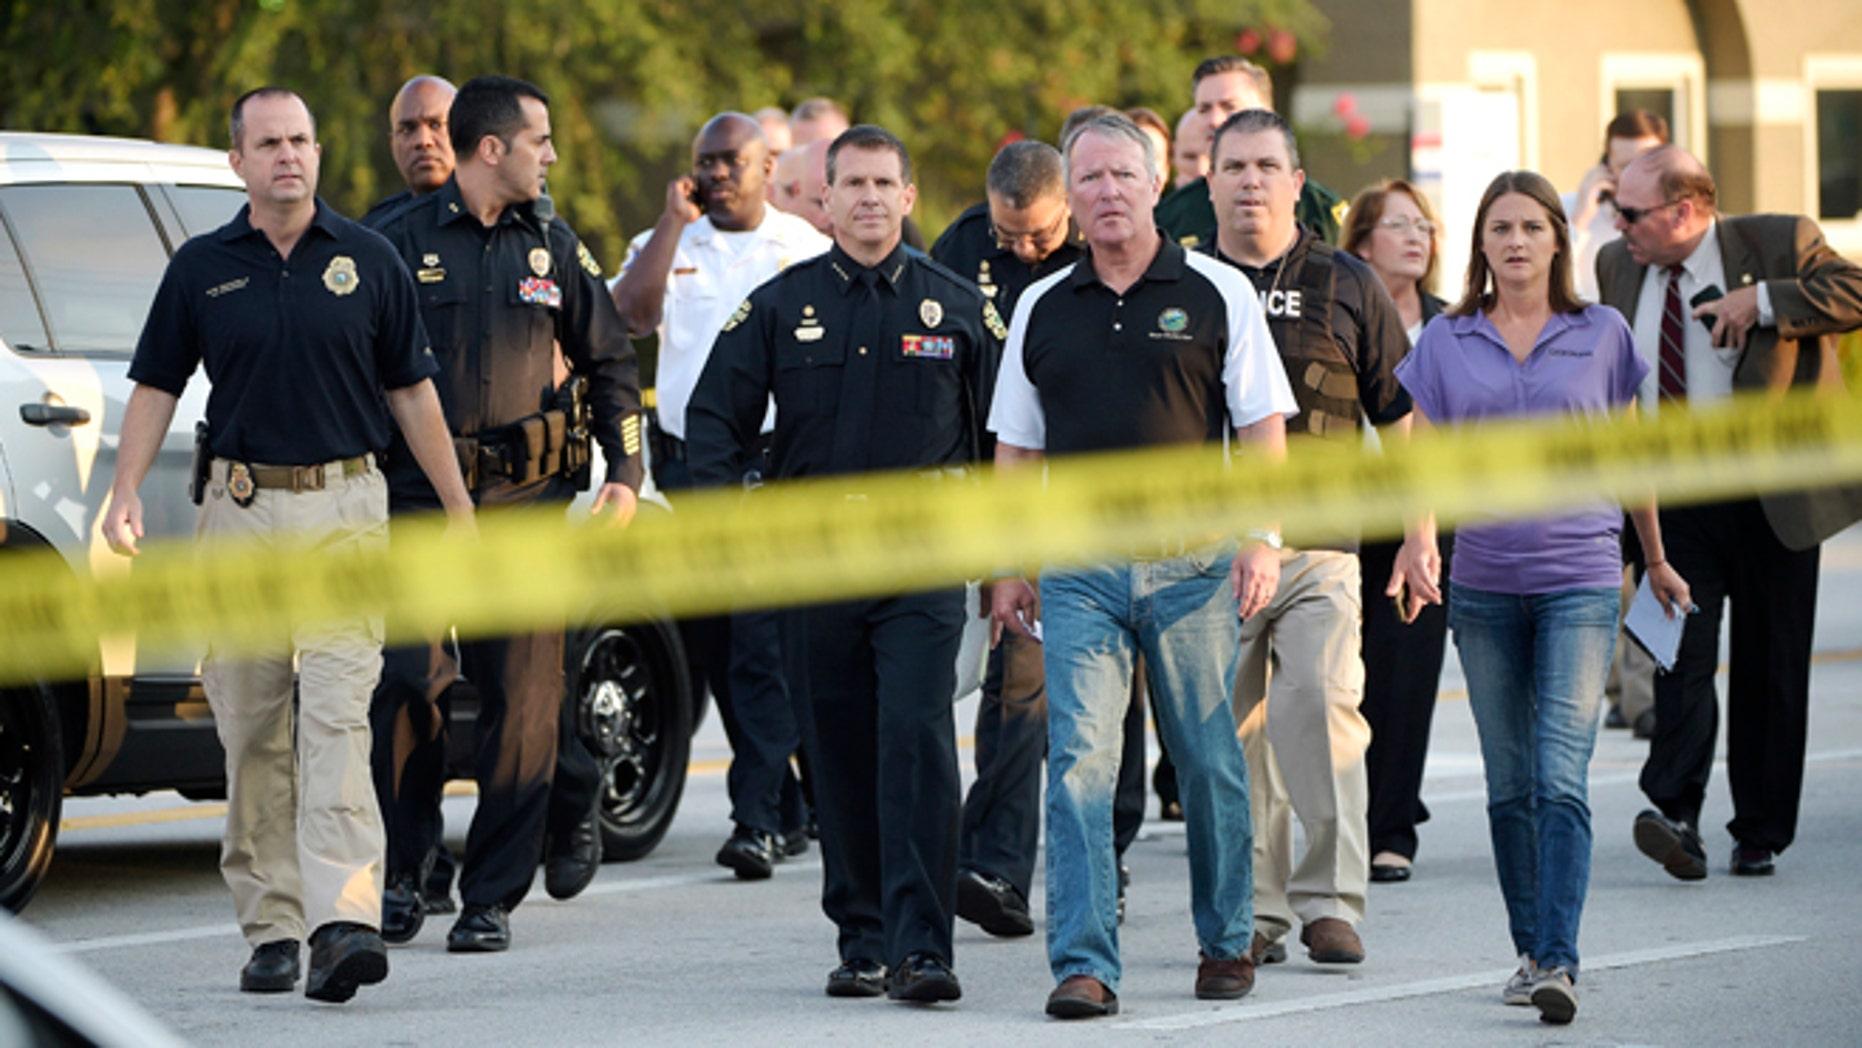 Orlando Mayor Buddy Dyer, center right, and Orlando Police Chief John Mina, center left, arrive to a news conference after a fatal shooting at Pulse Orlando nightclub in Orlando, Fla., Sunday, June 12, 2016. (AP Photo/Phelan M. Ebenhack)